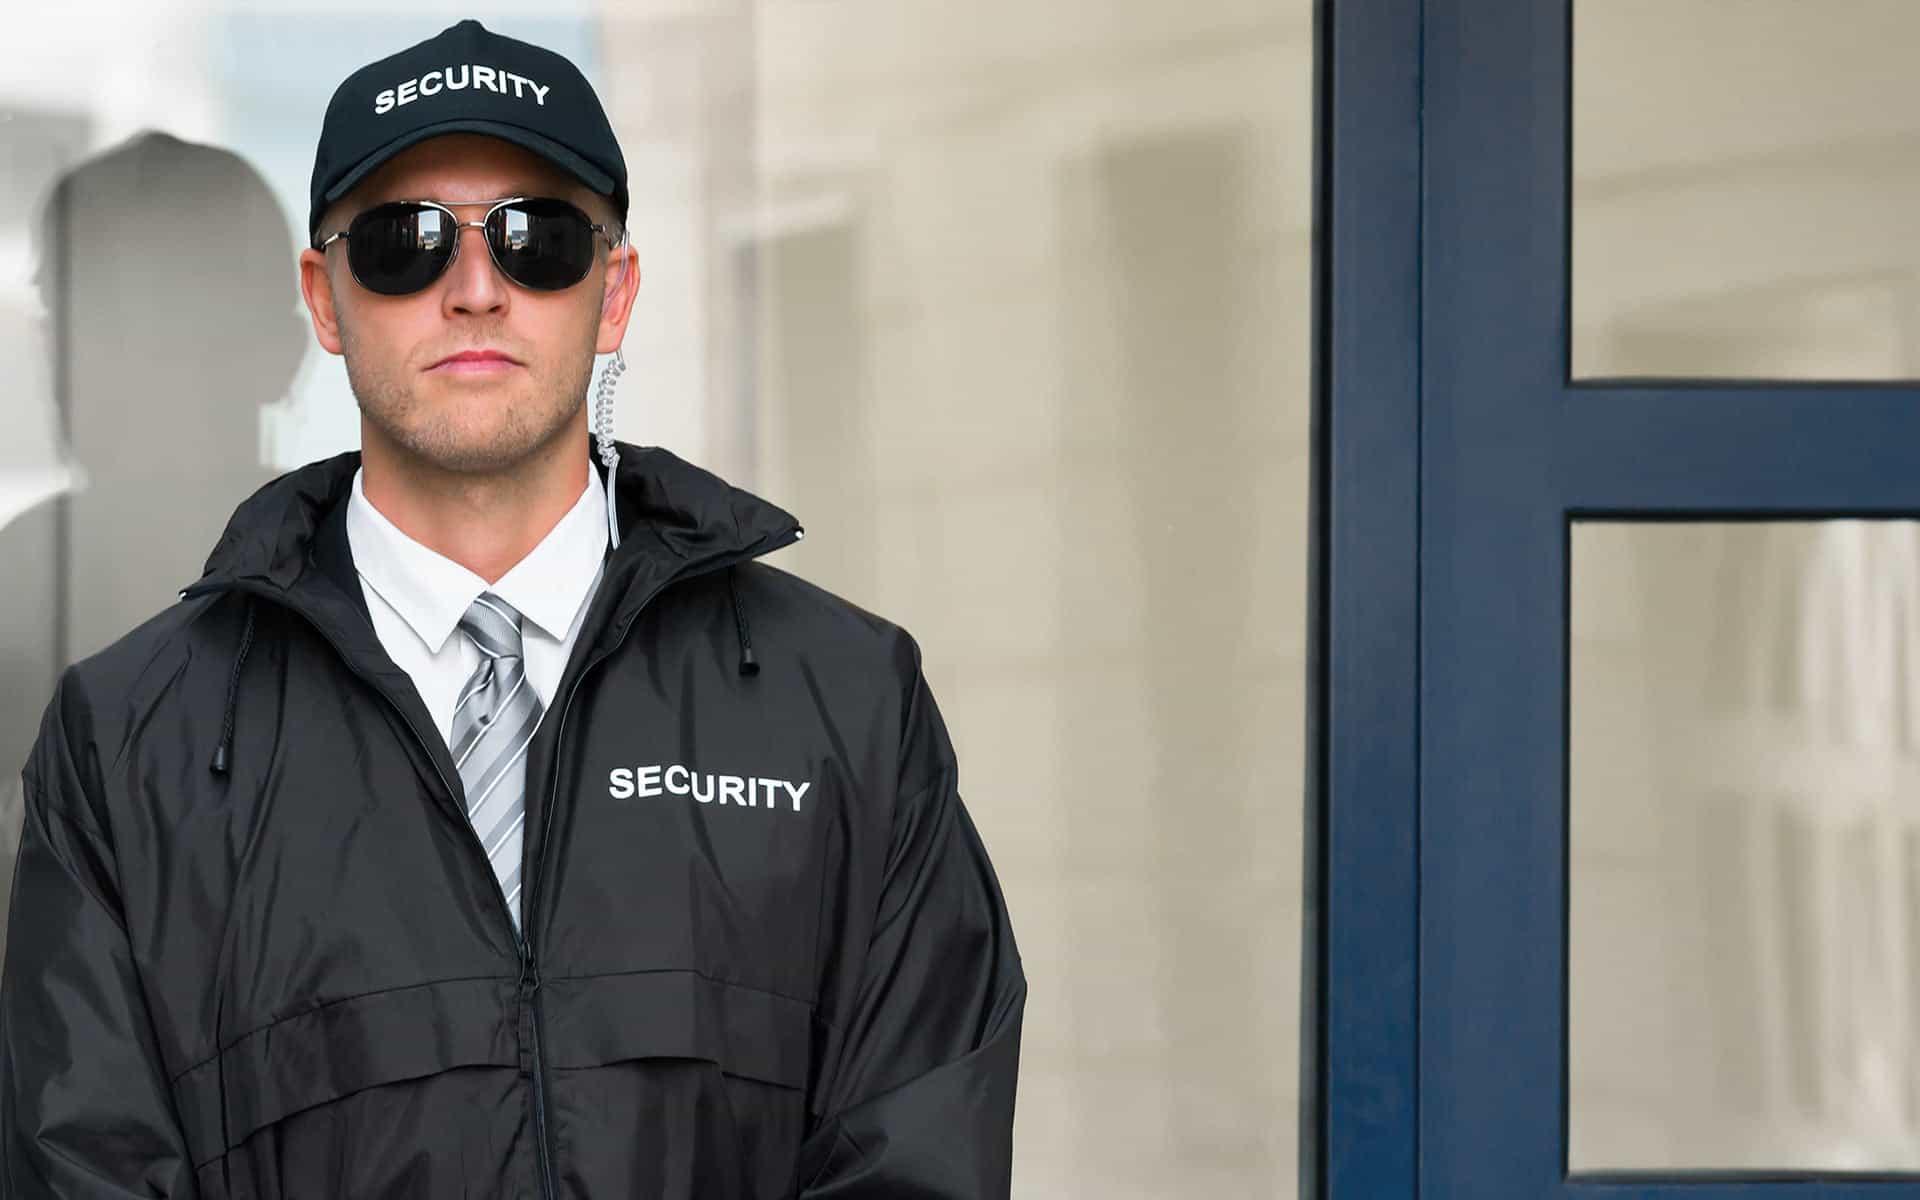 Security-Guard-Services Valencia